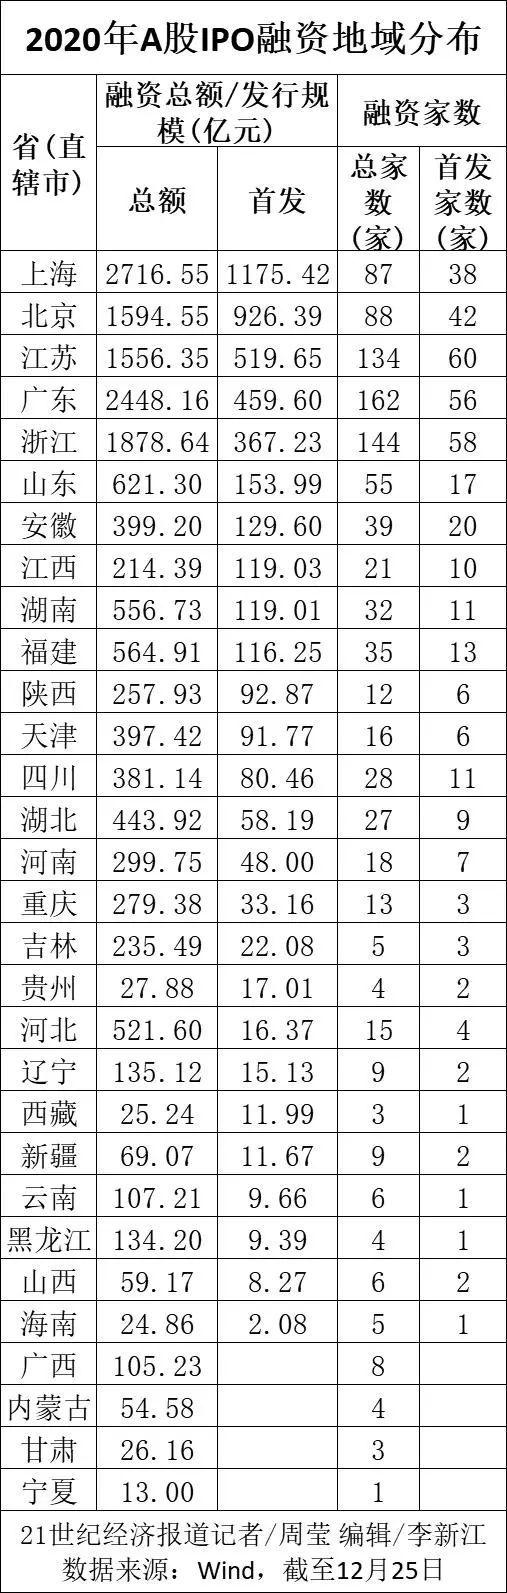 "usdt不用实名买入卖出(caibao.it):5张图还原A股IPO""十年新高"":筹资额榜首不止医药、半导体,仍有多省份颗粒无收 第3张"